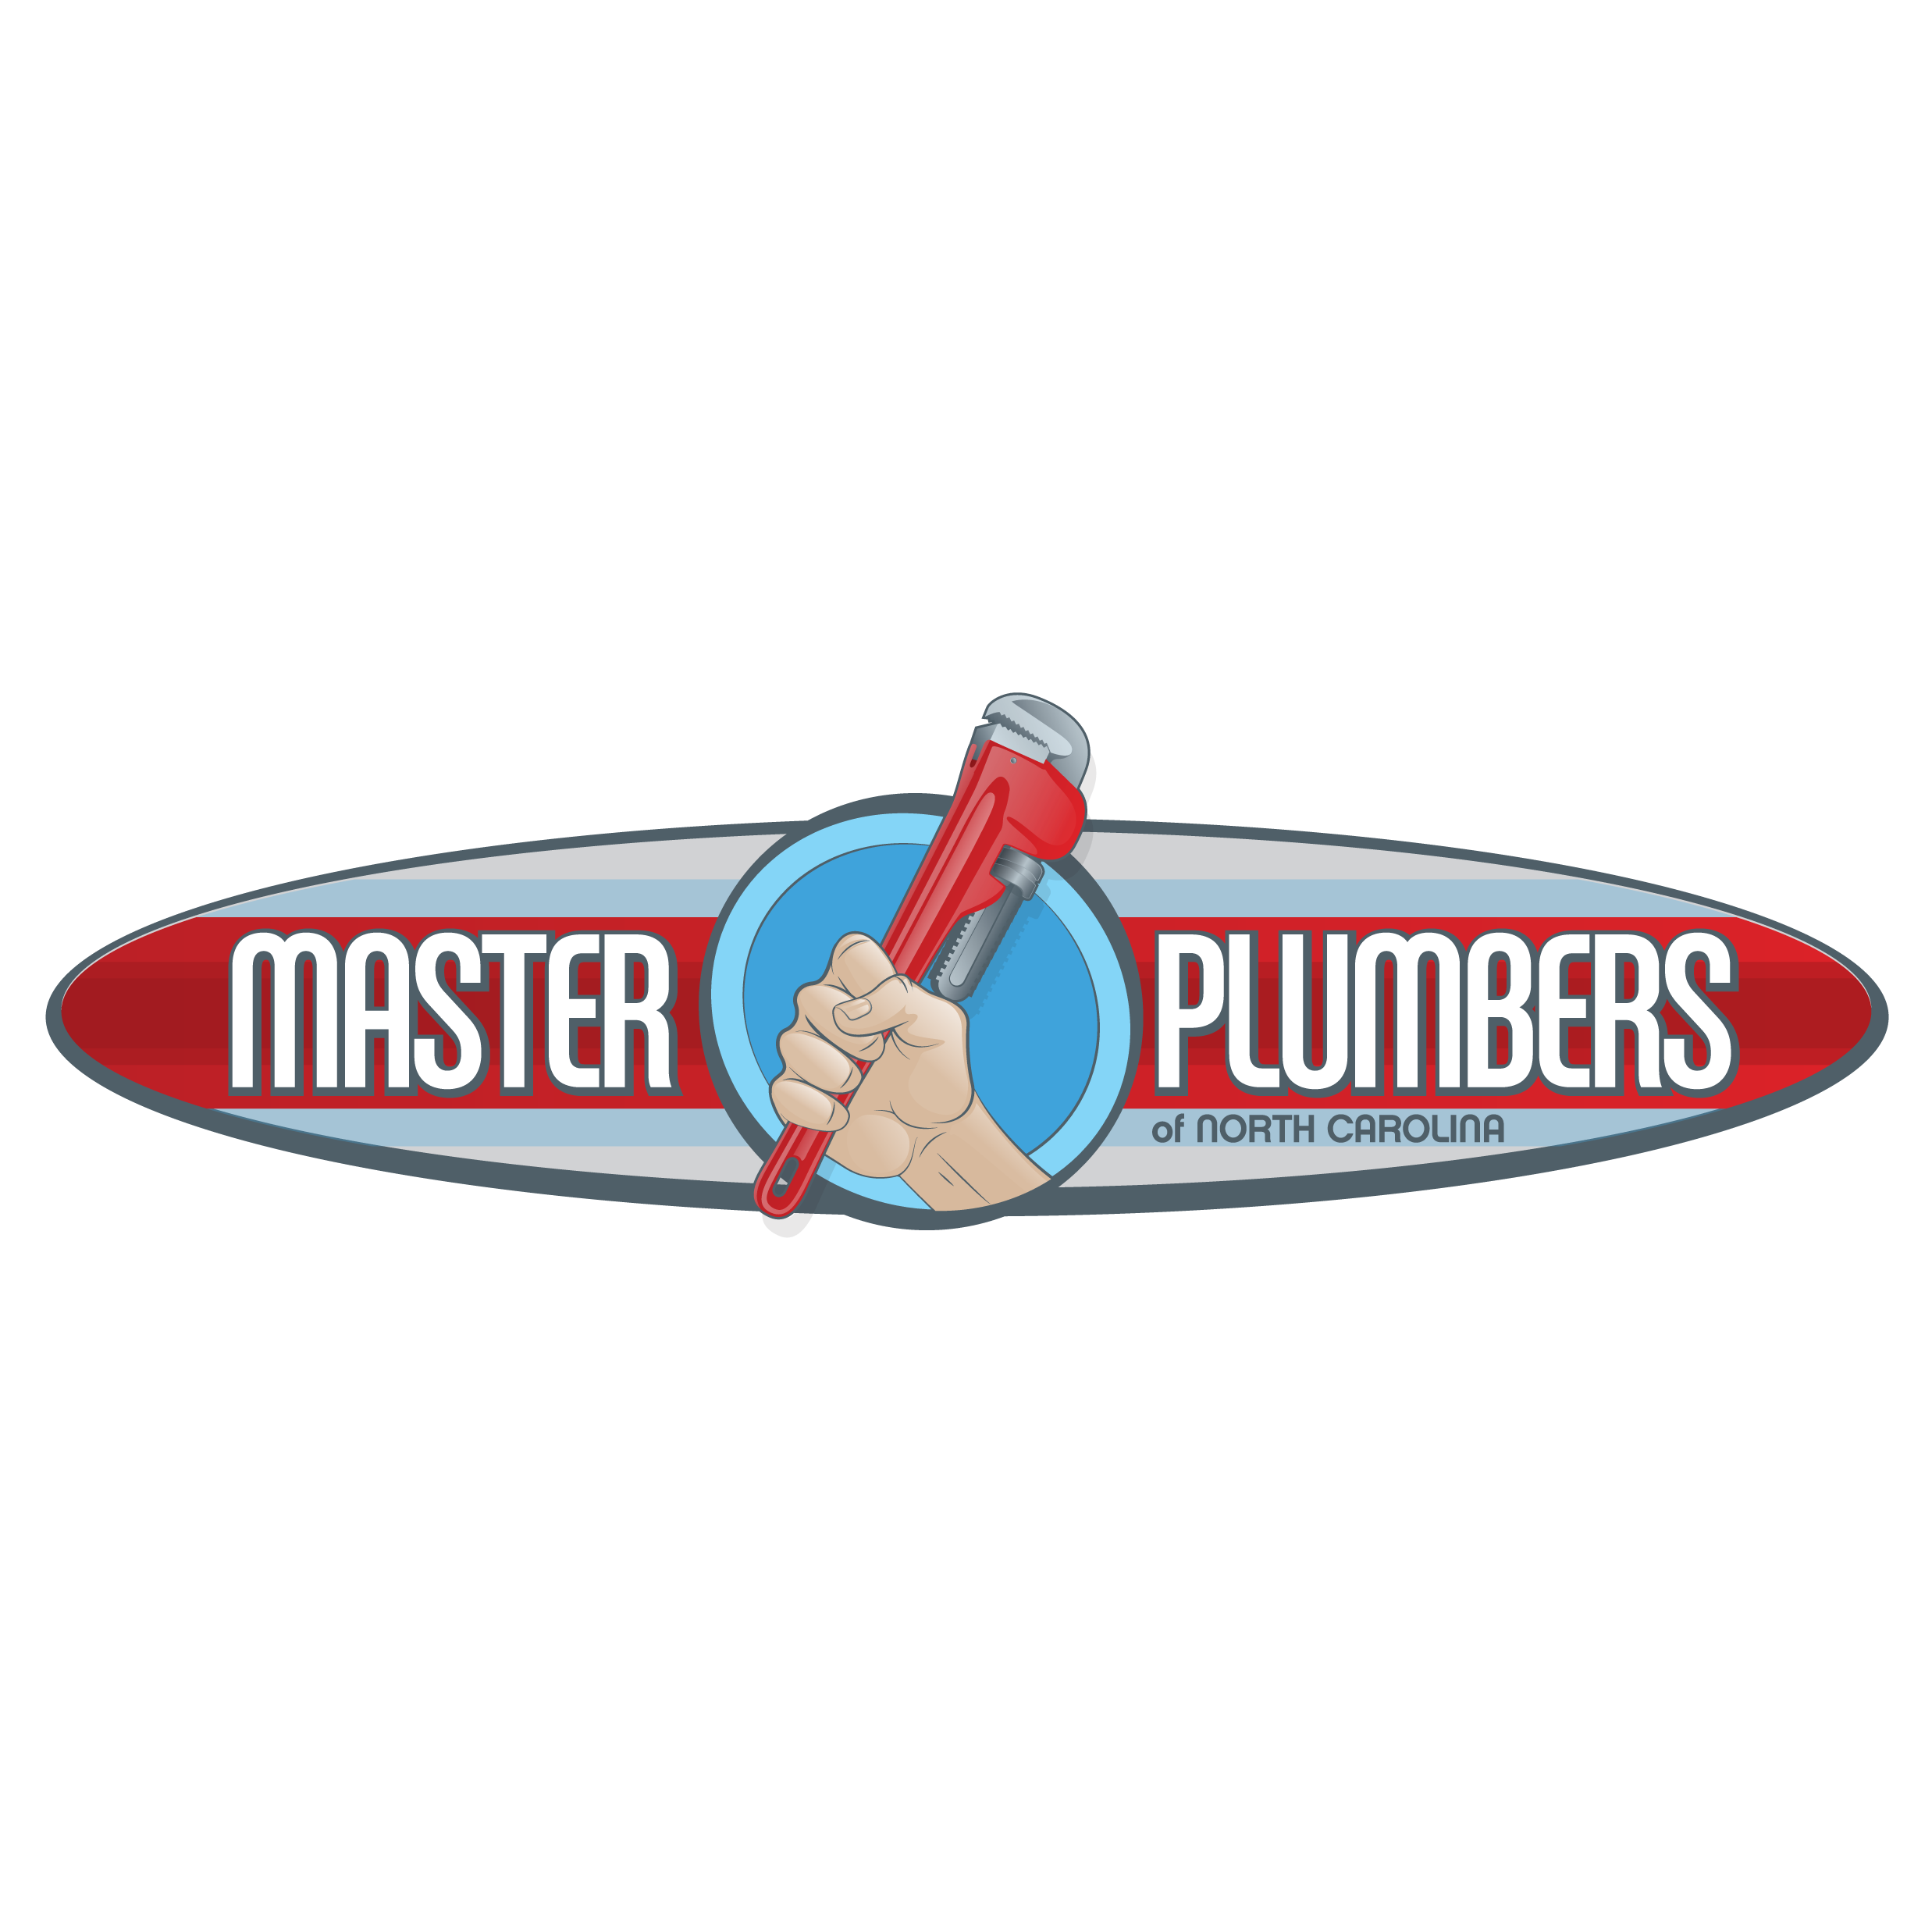 Master Plumbers of NC